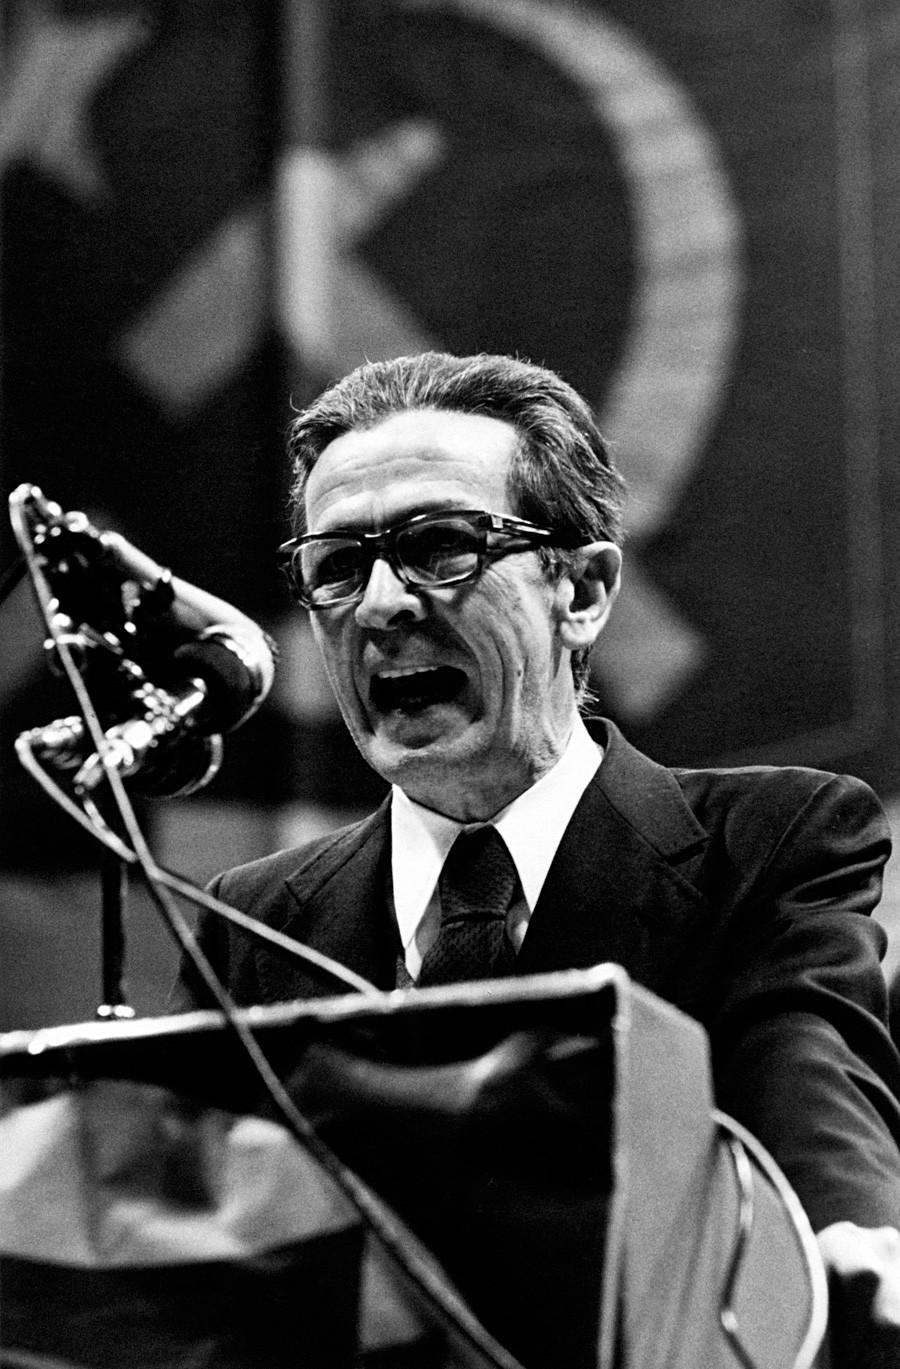 Sekretaris Partai Komunis Italia Enrico Berlinguer, yang membuat partainya berpaling dari Uni Soviet, berbicara dalam sebuah pertemuan, tahun 1980-an.